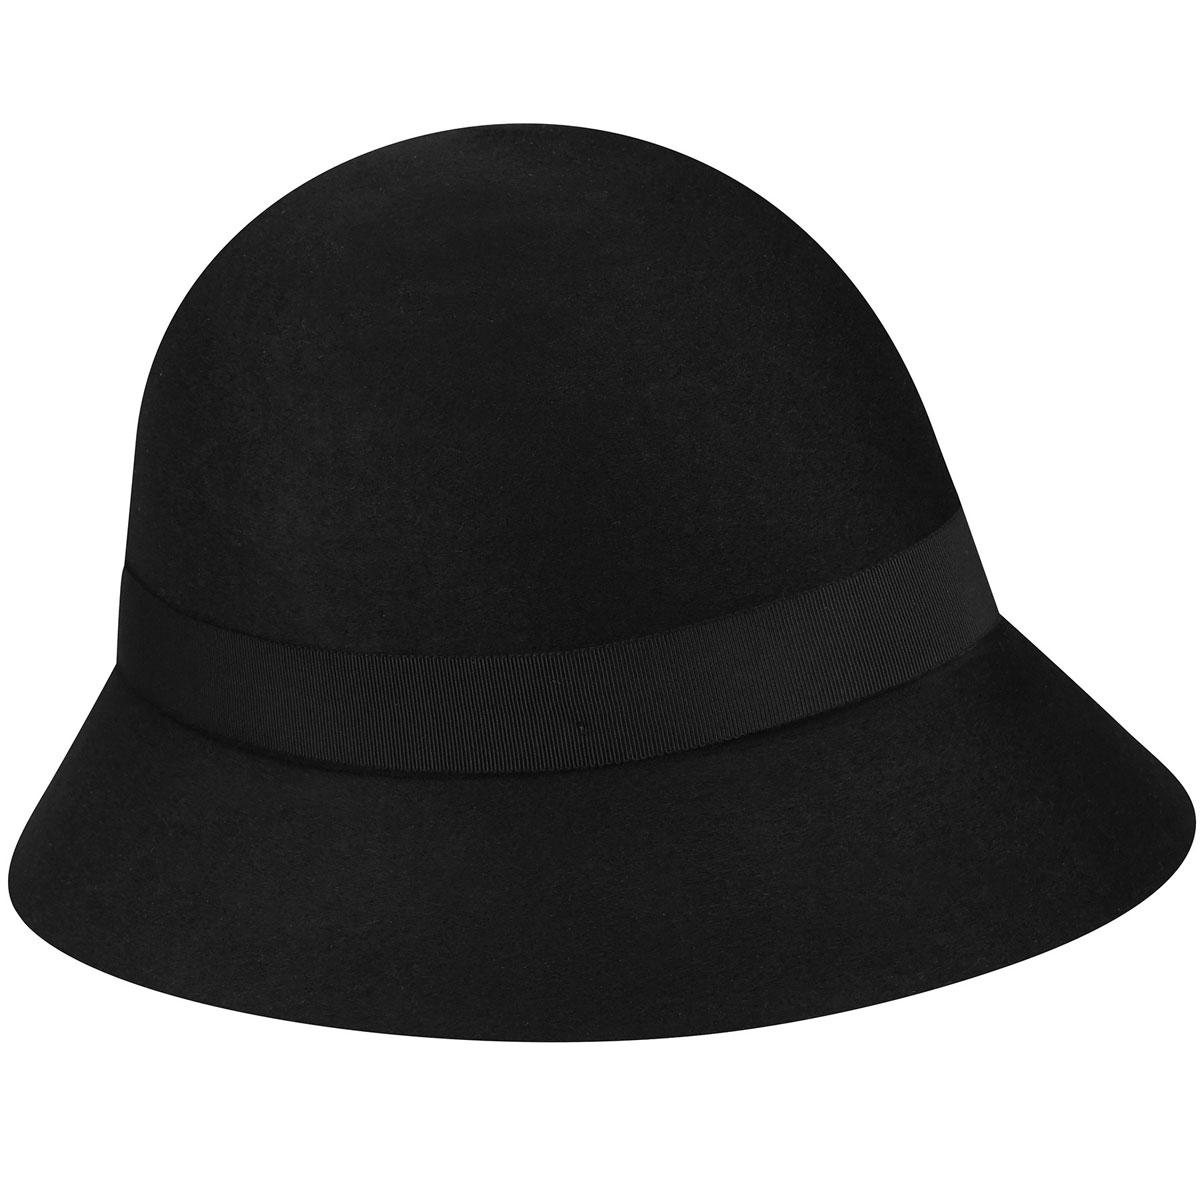 Betmar Barton Cloche in Black